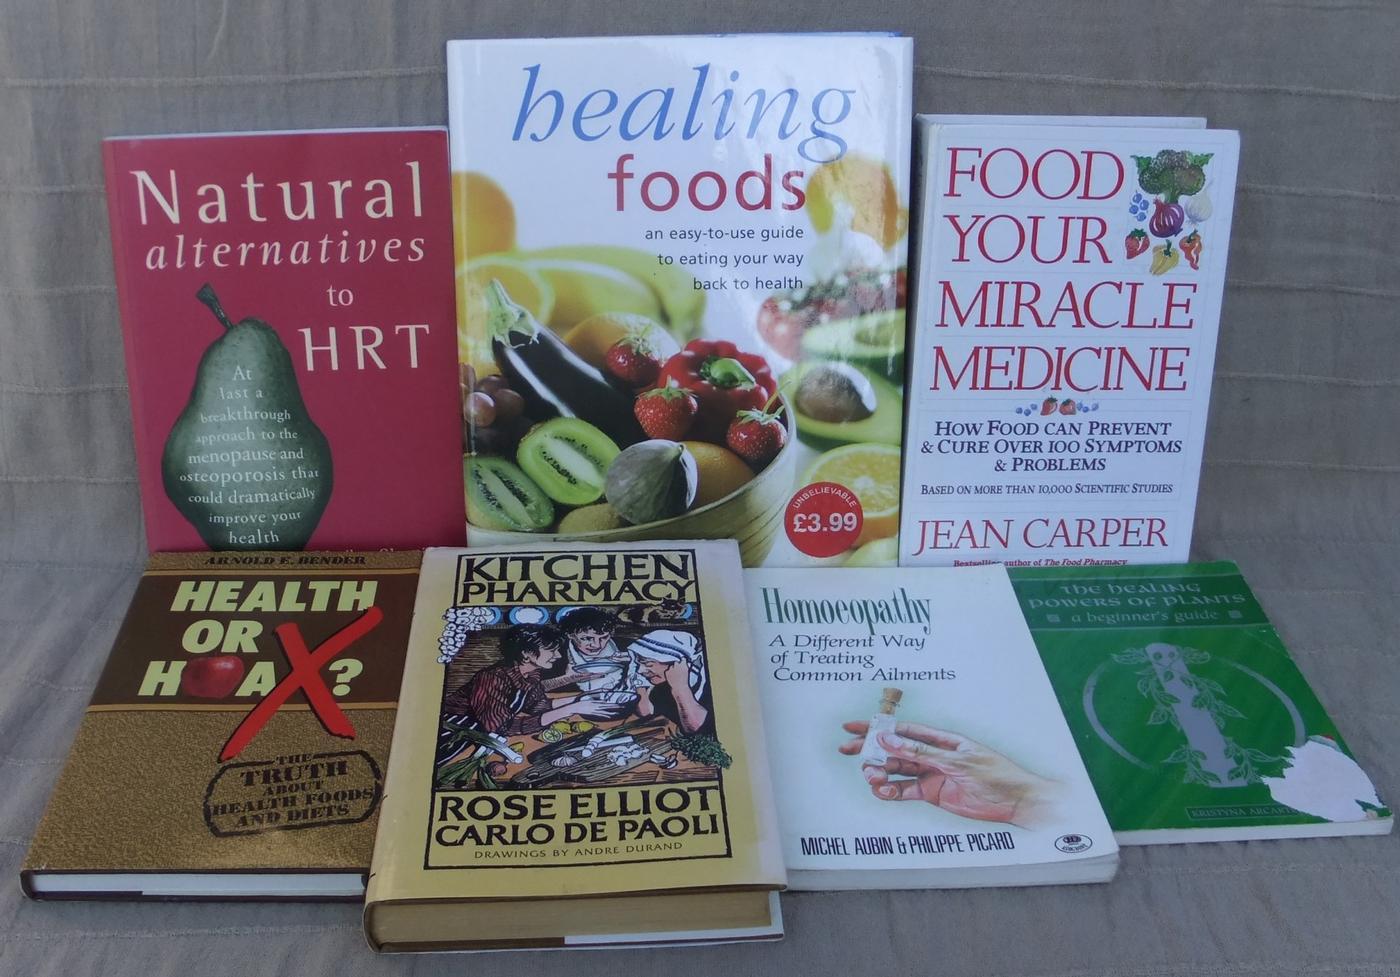 Homeopathy, Health Food, Diet Books